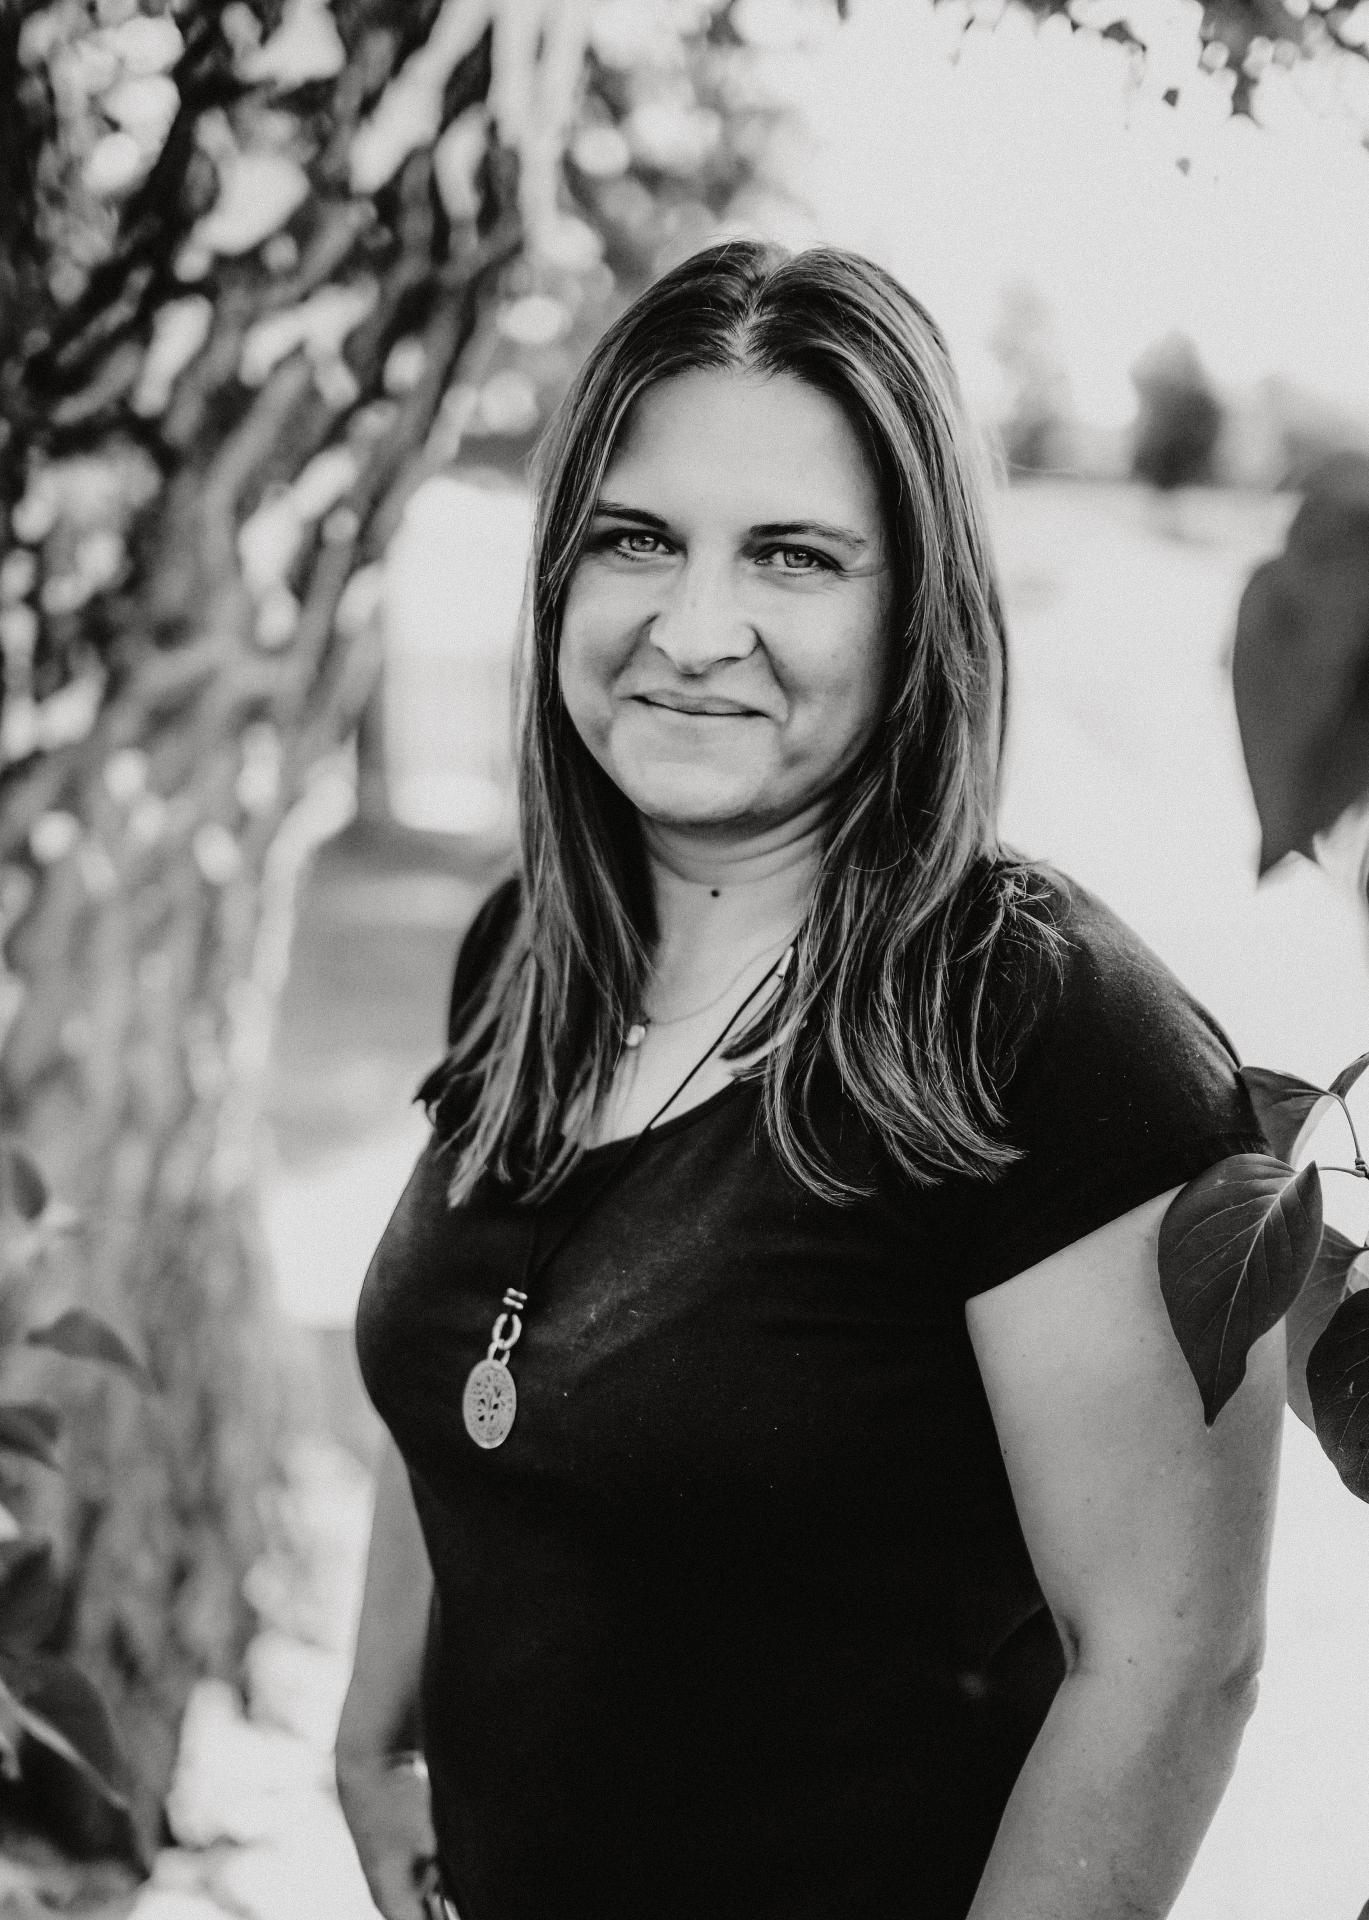 Daniela Maydl